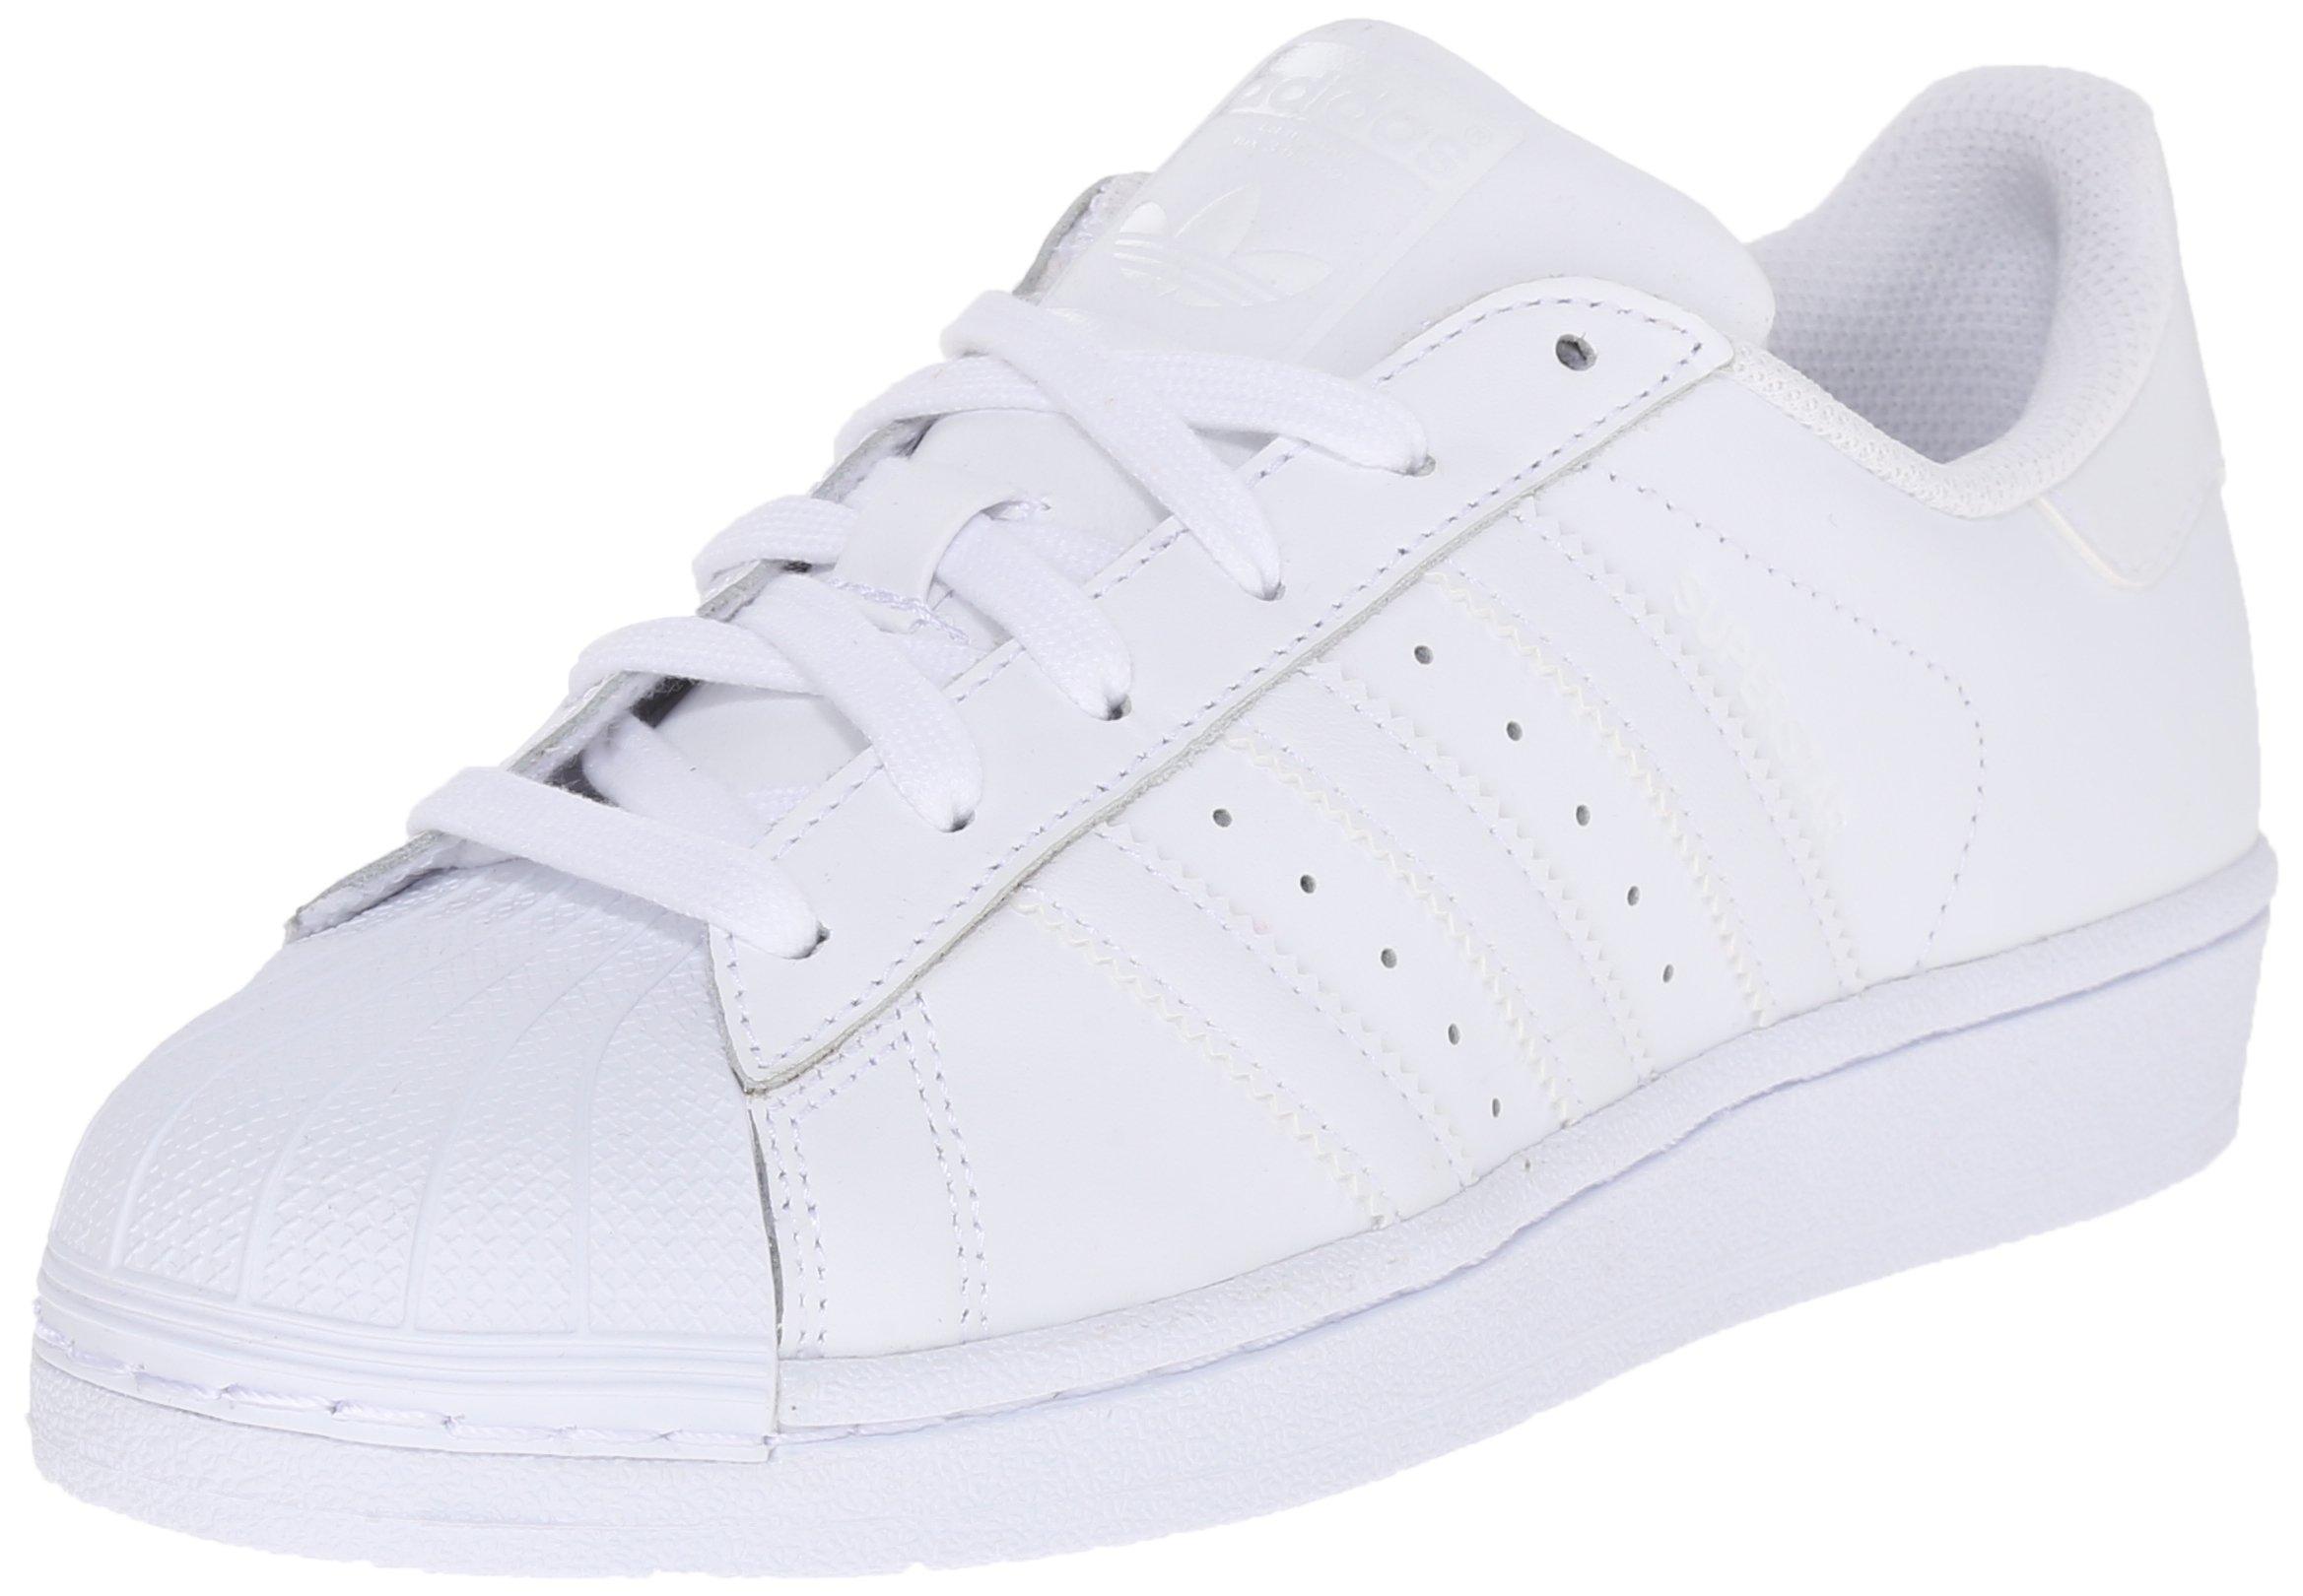 adidas Originals Superstar Foundation J Casual Basketball-Inspired Low-Cut Sneaker (Big Kid),White/White/White,4.5 M US Big Kid